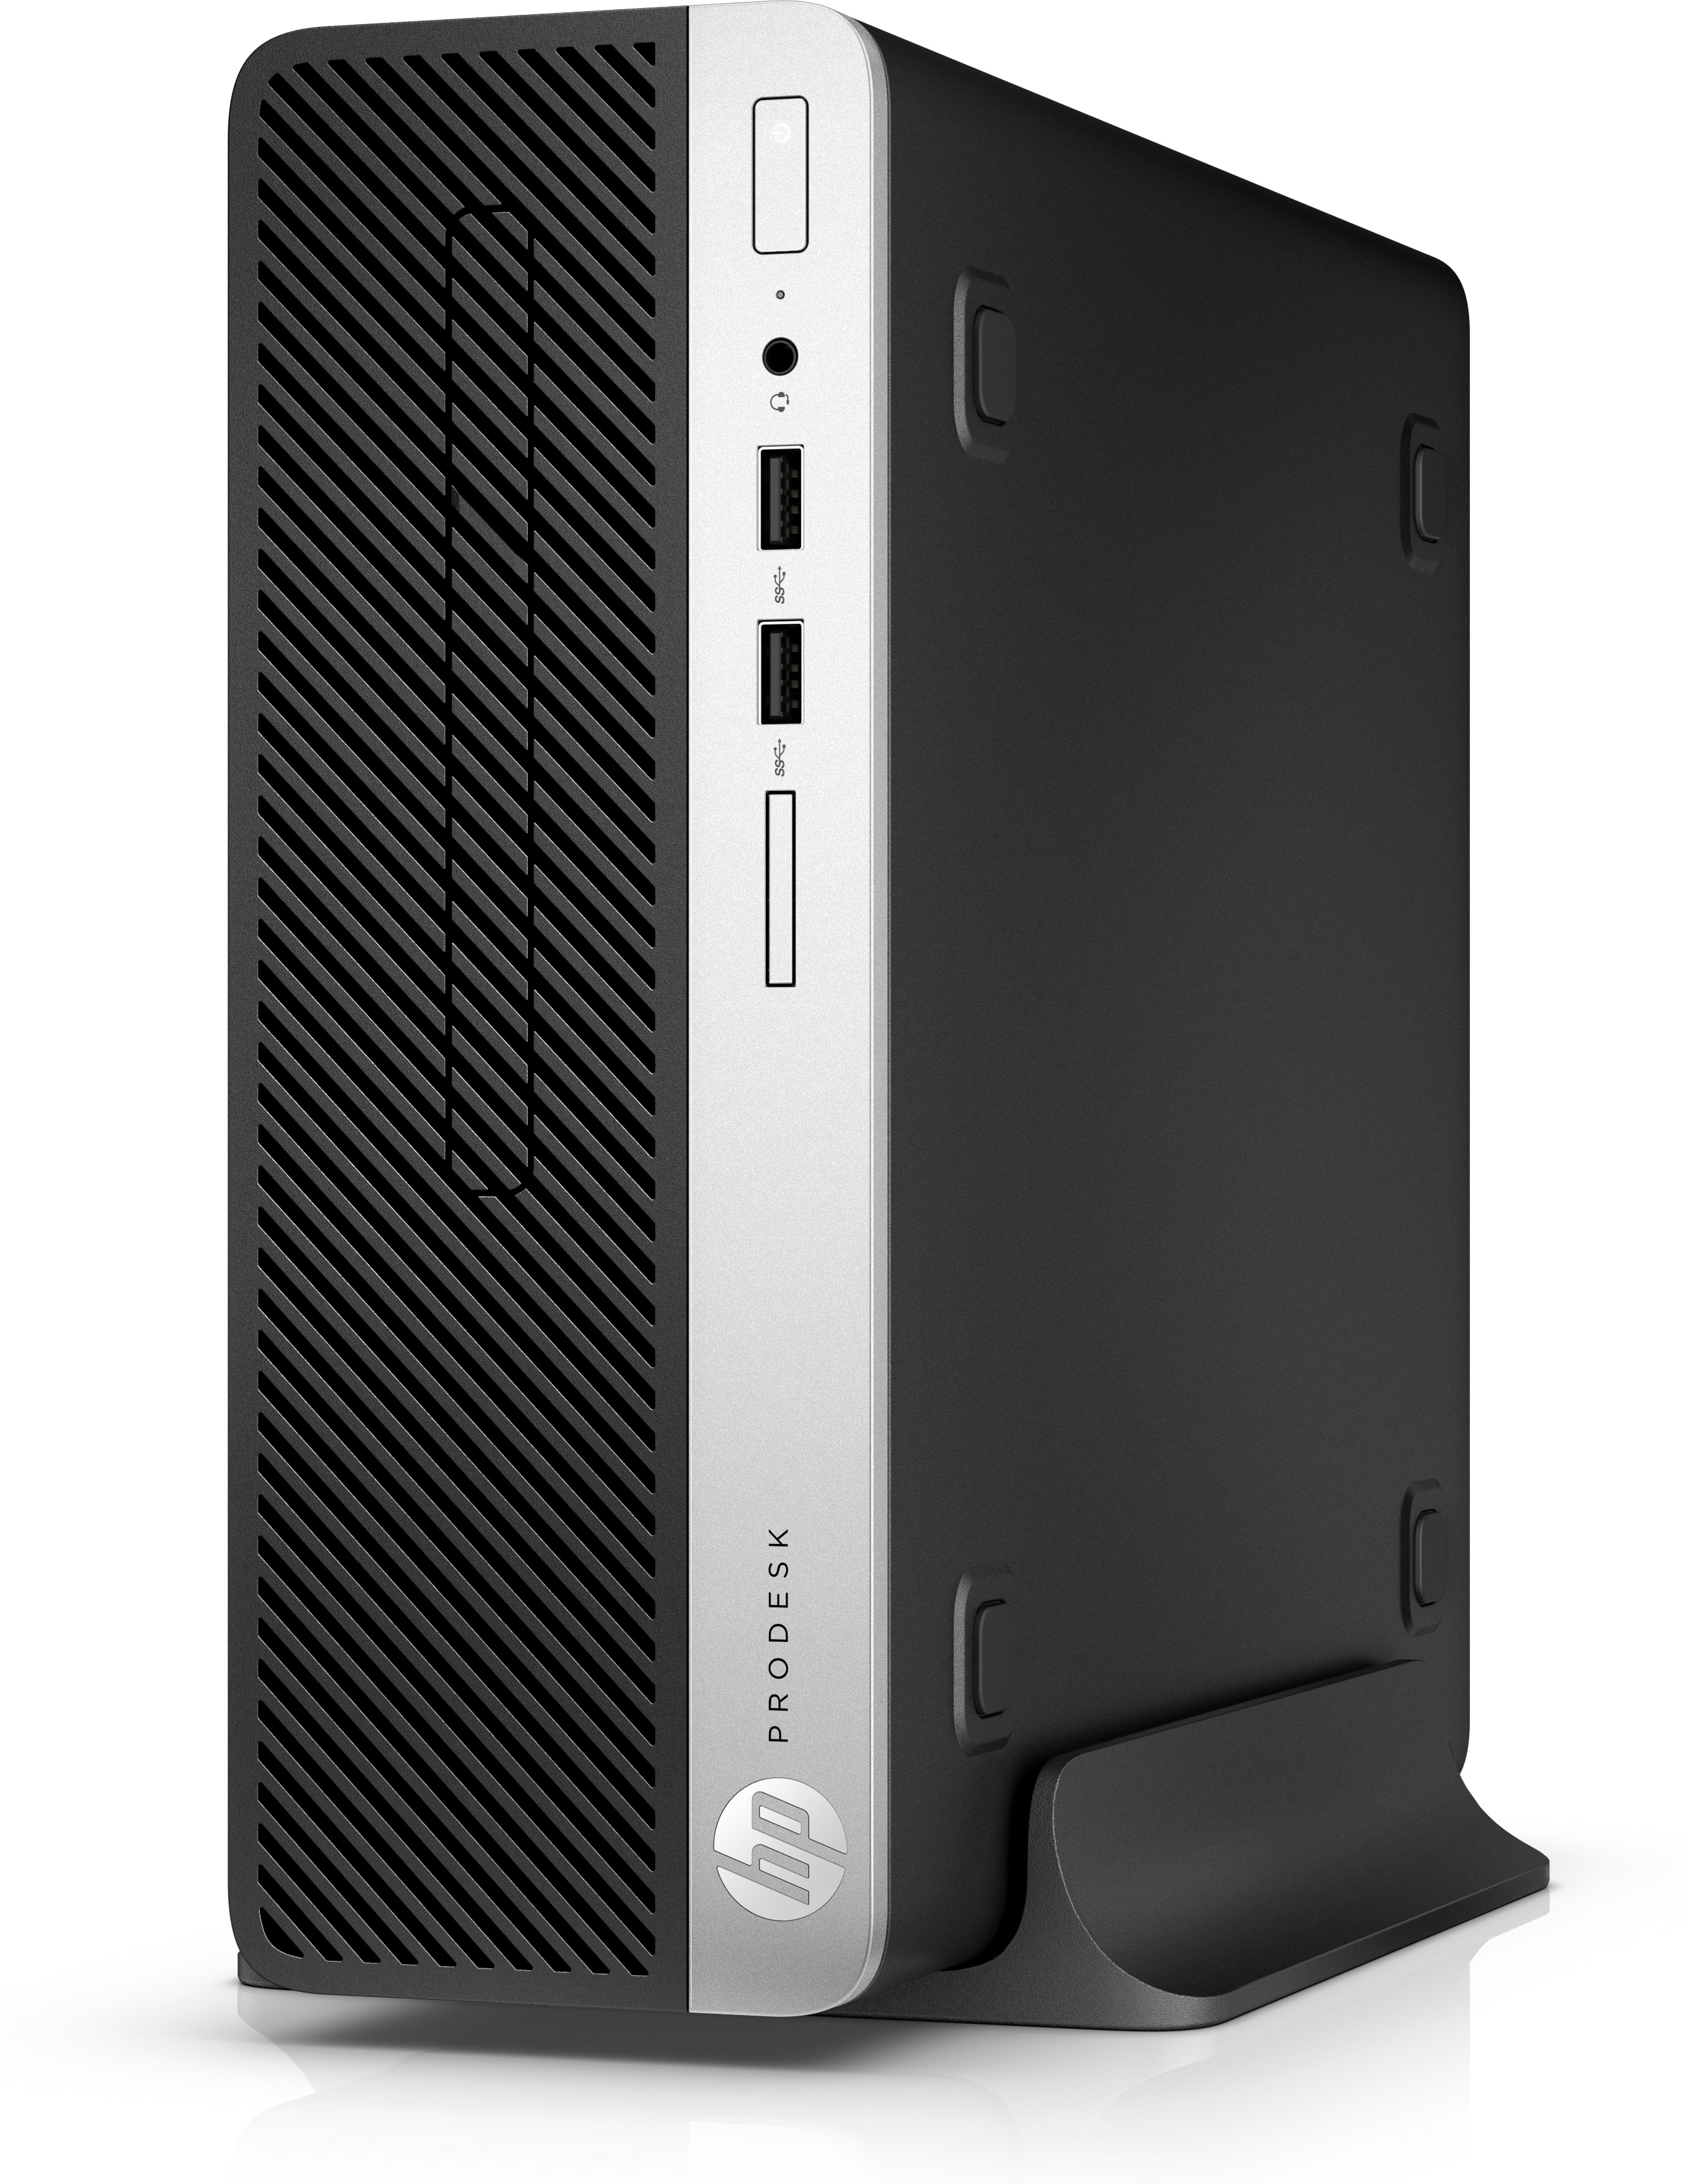 Hp Prodesk 400 G4 Sff Desktop Pc Intel Core I5 7500 8gb